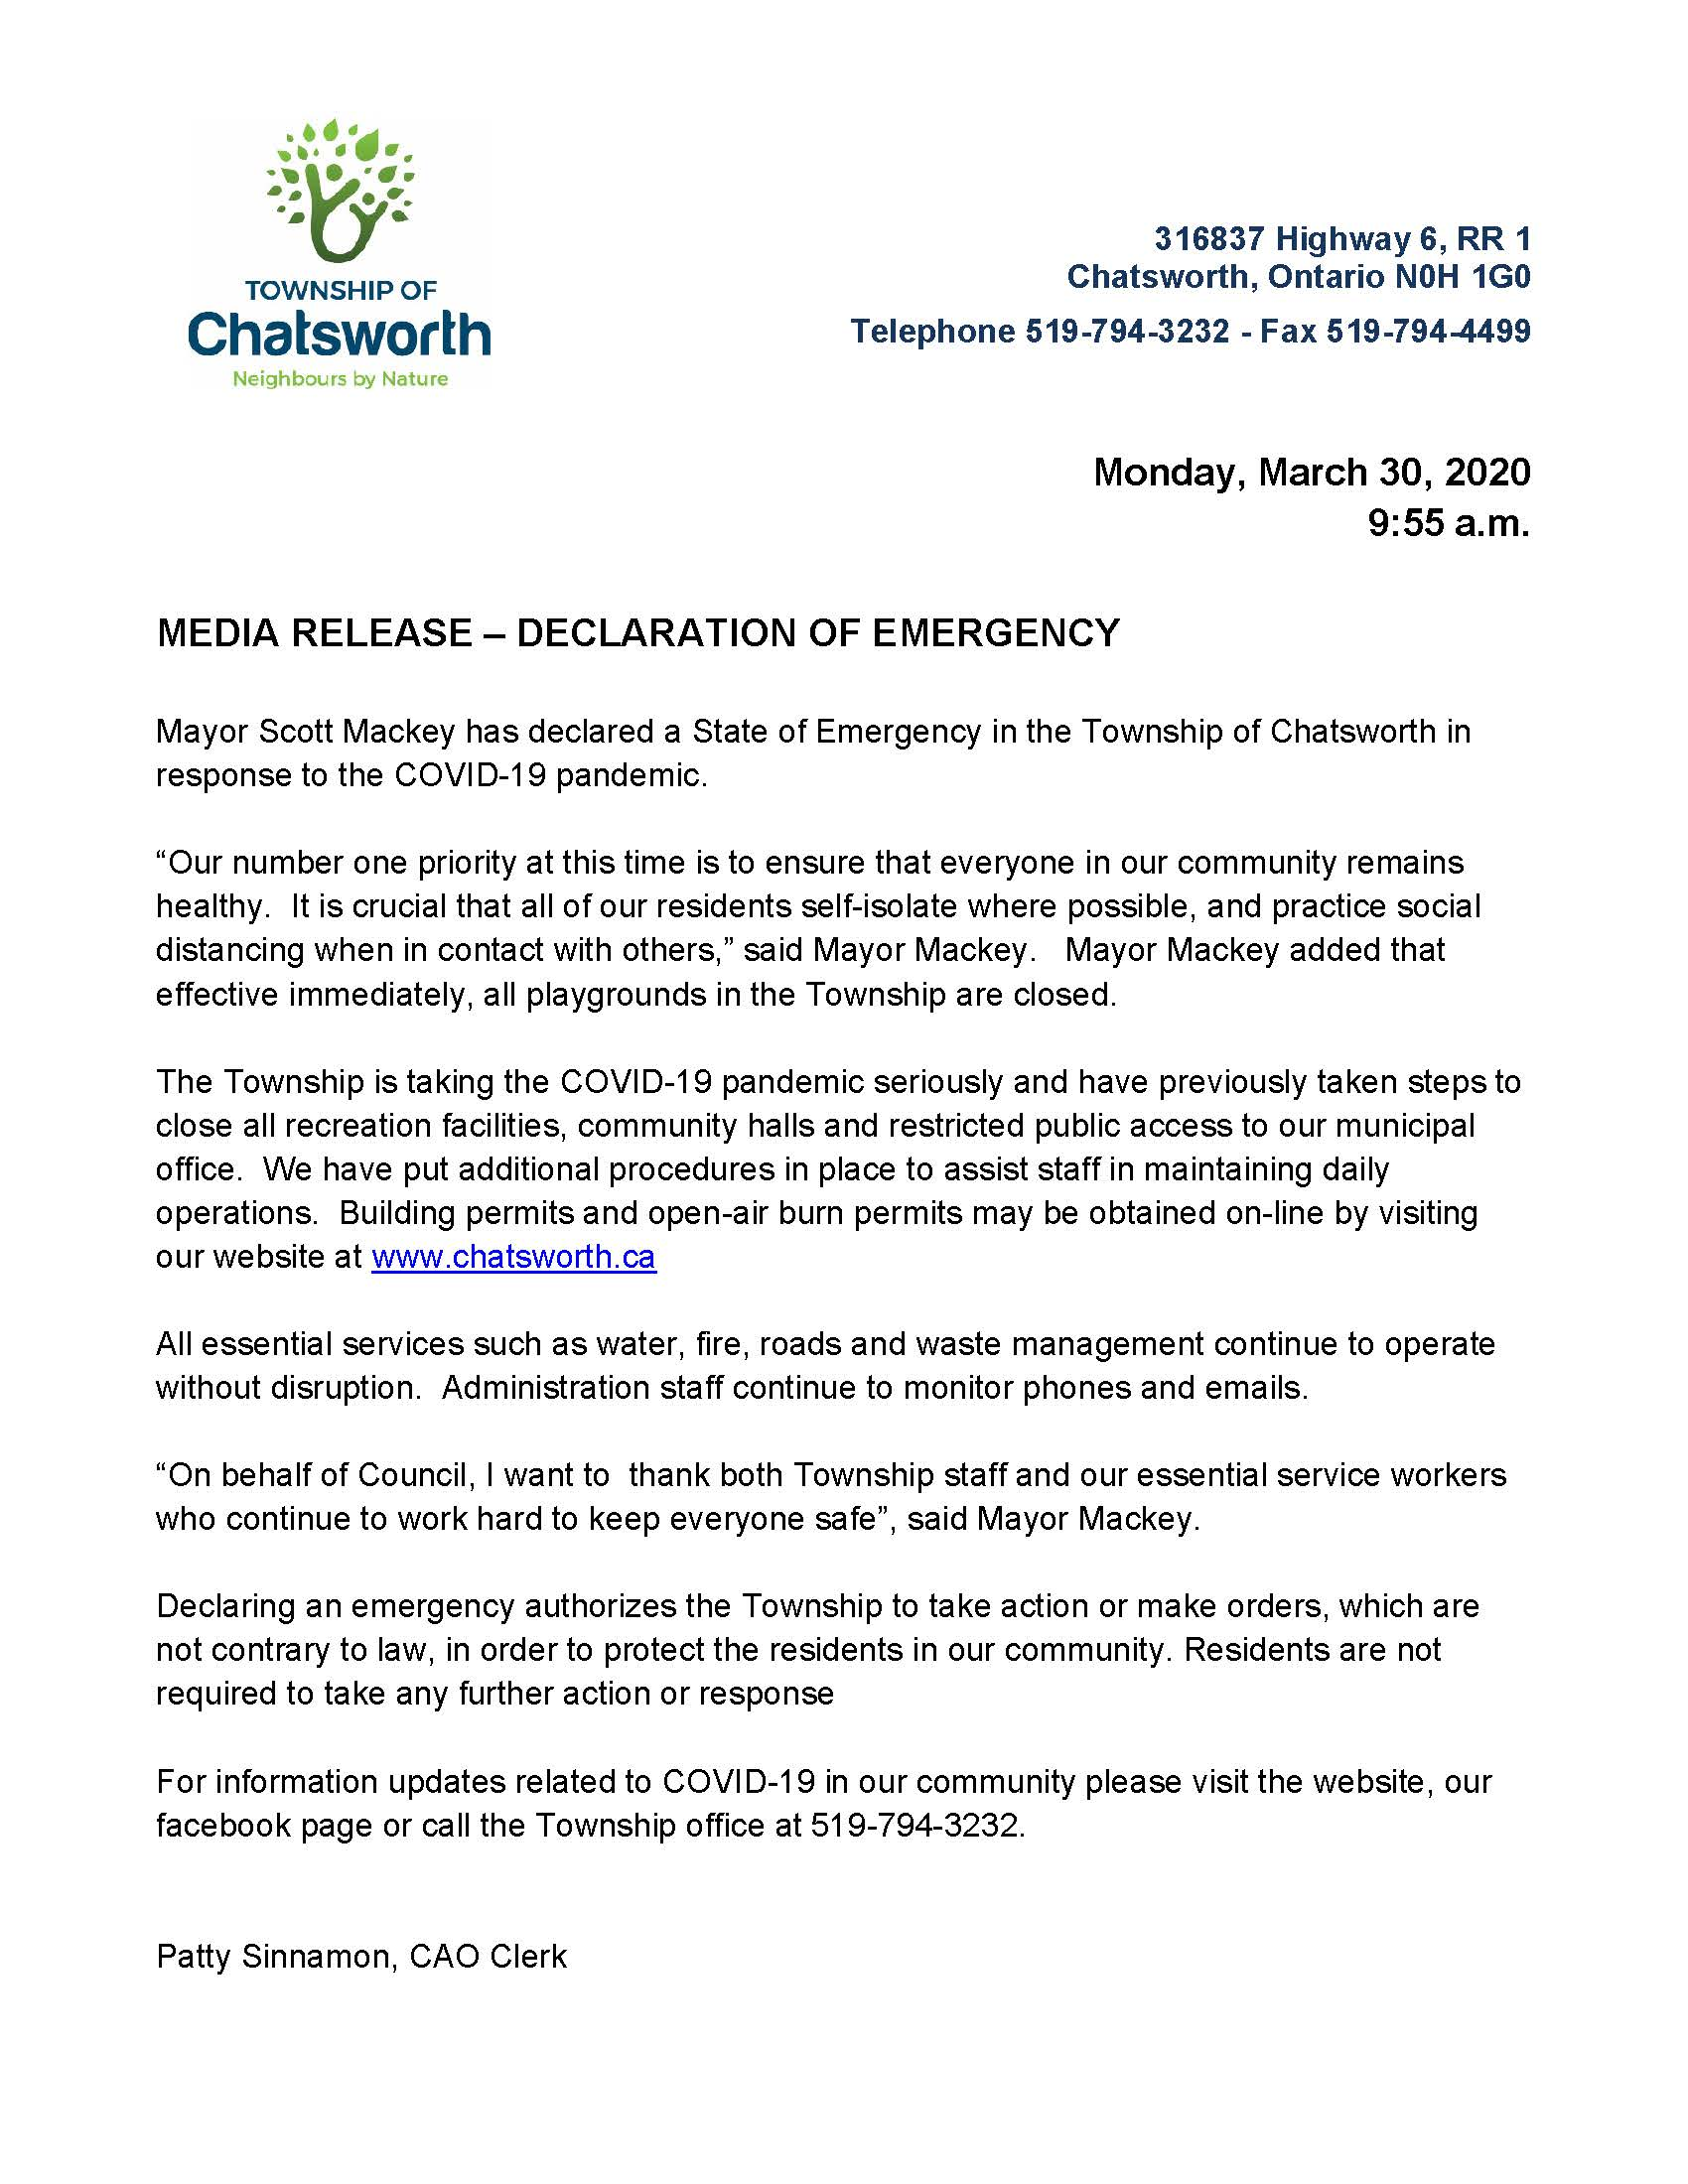 Press Release - March 30, Declaration of Emergency